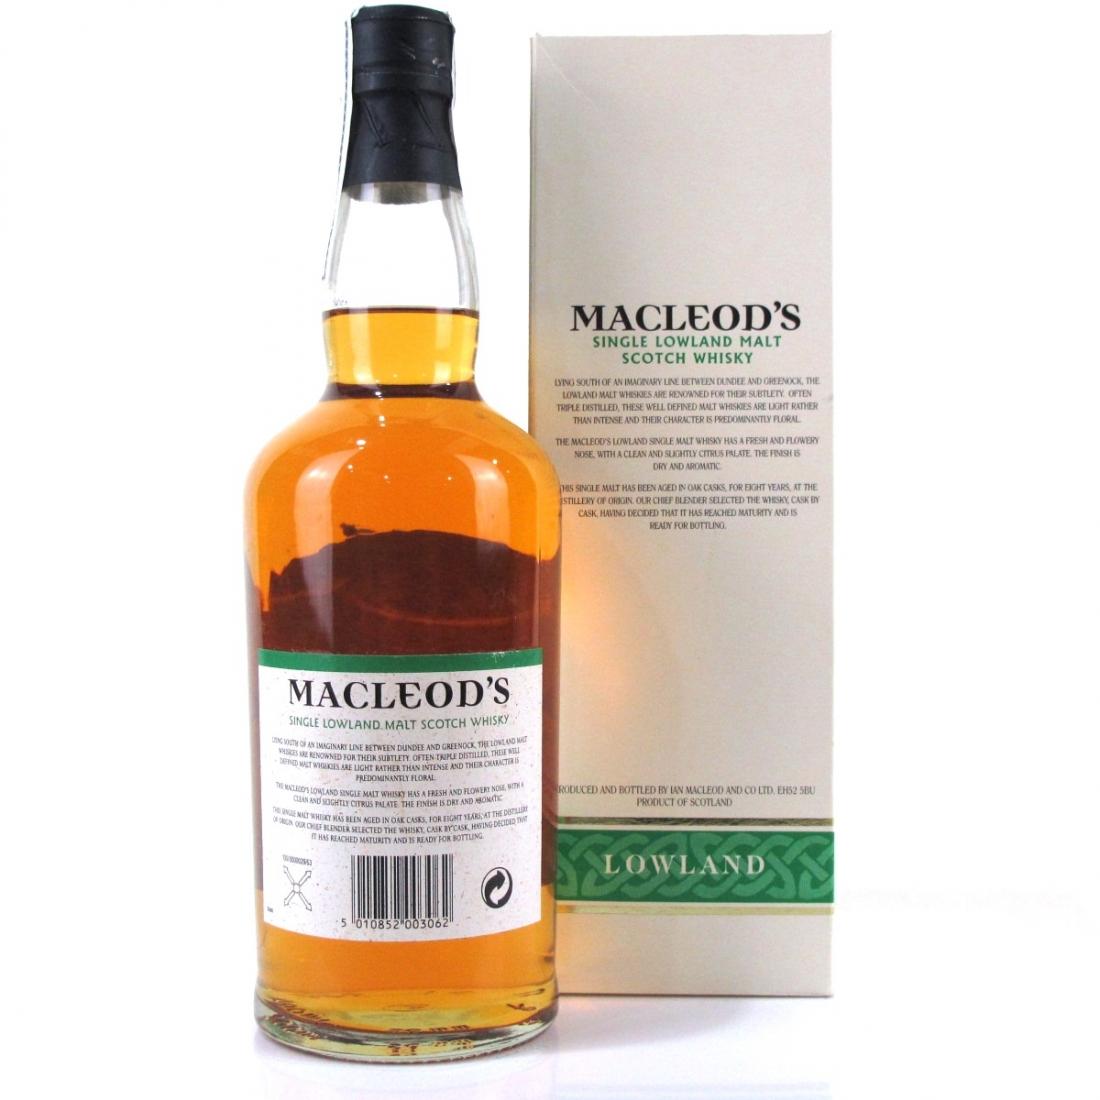 Macleod's 8 Year Old Lowland Single Malt